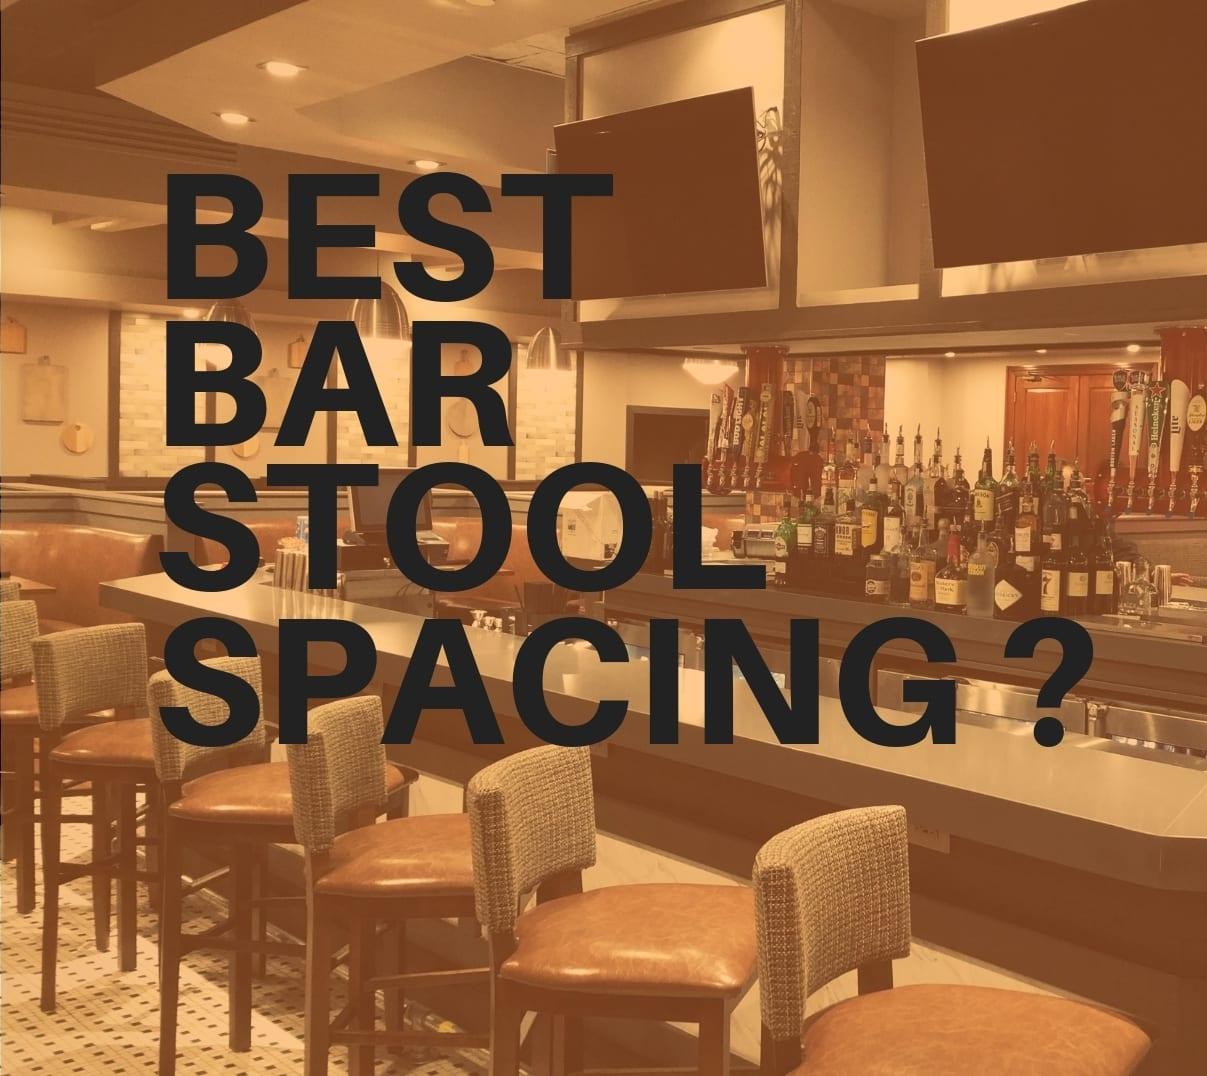 BEST-BAR-STOOL-SPACING-TN